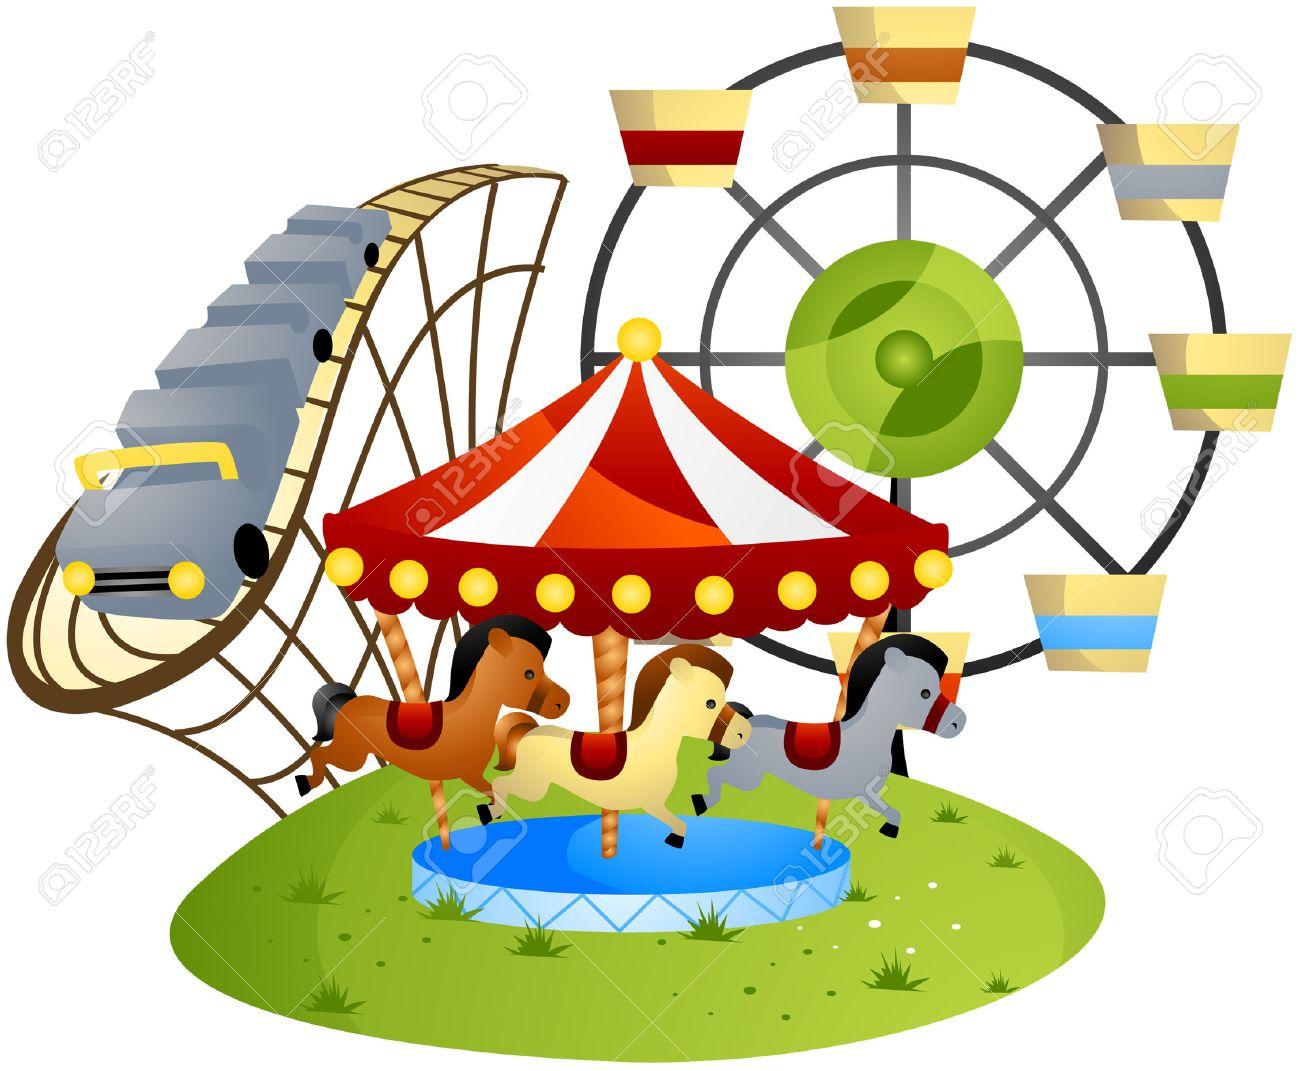 amusement park cartoon with clipping path royalty free cliparts rh 123rf com amusement park clip art border amusement park clip art border